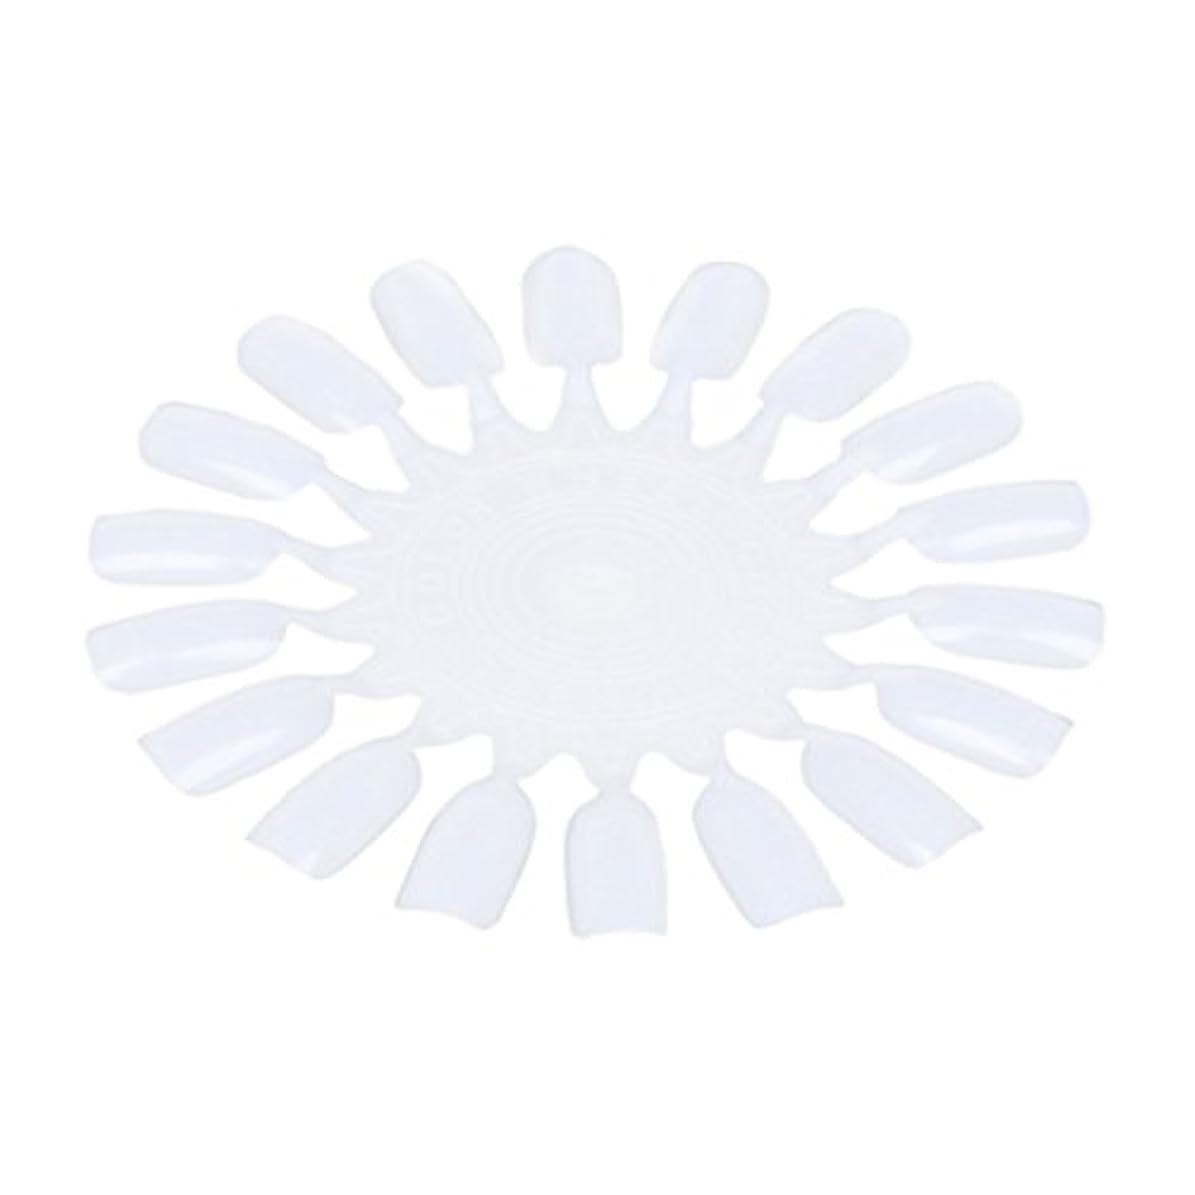 Nrpfell 10個 メークアップ化粧ネイル ポーランドカラー段ボールカラーチャート18カラー ベージュ